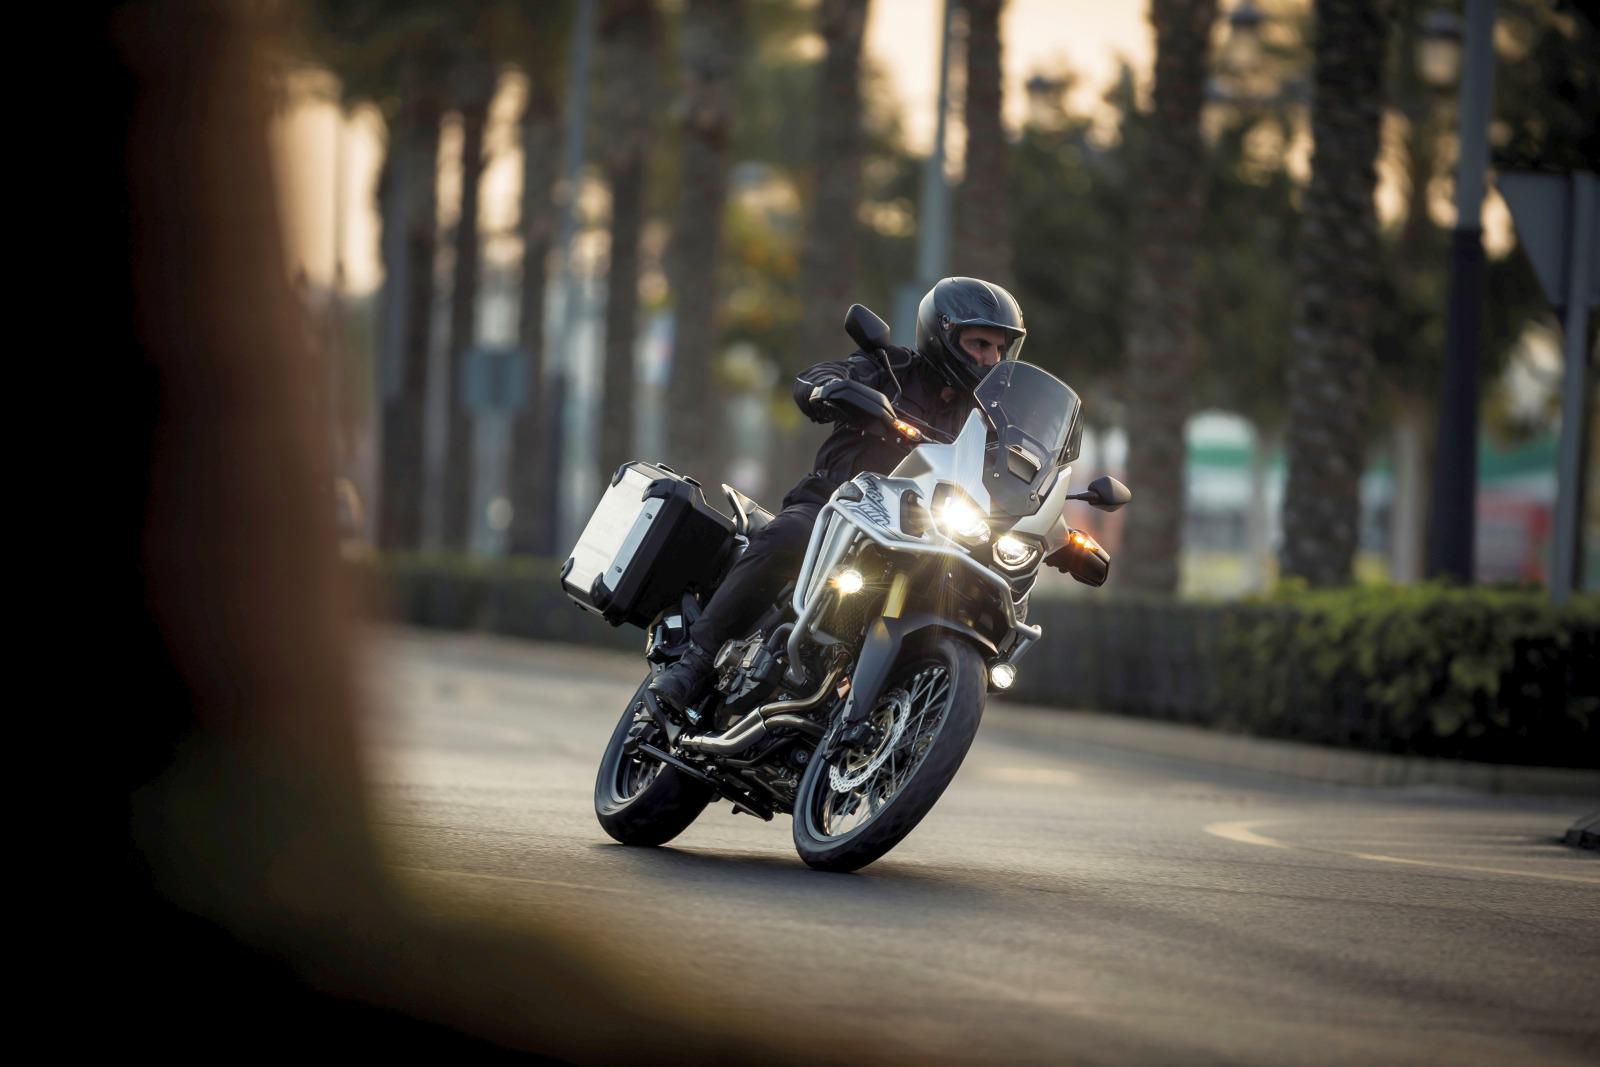 New 2016 Honda Africa Twin Accessories Announced | CRF1000L | Honda-Pro Kevin